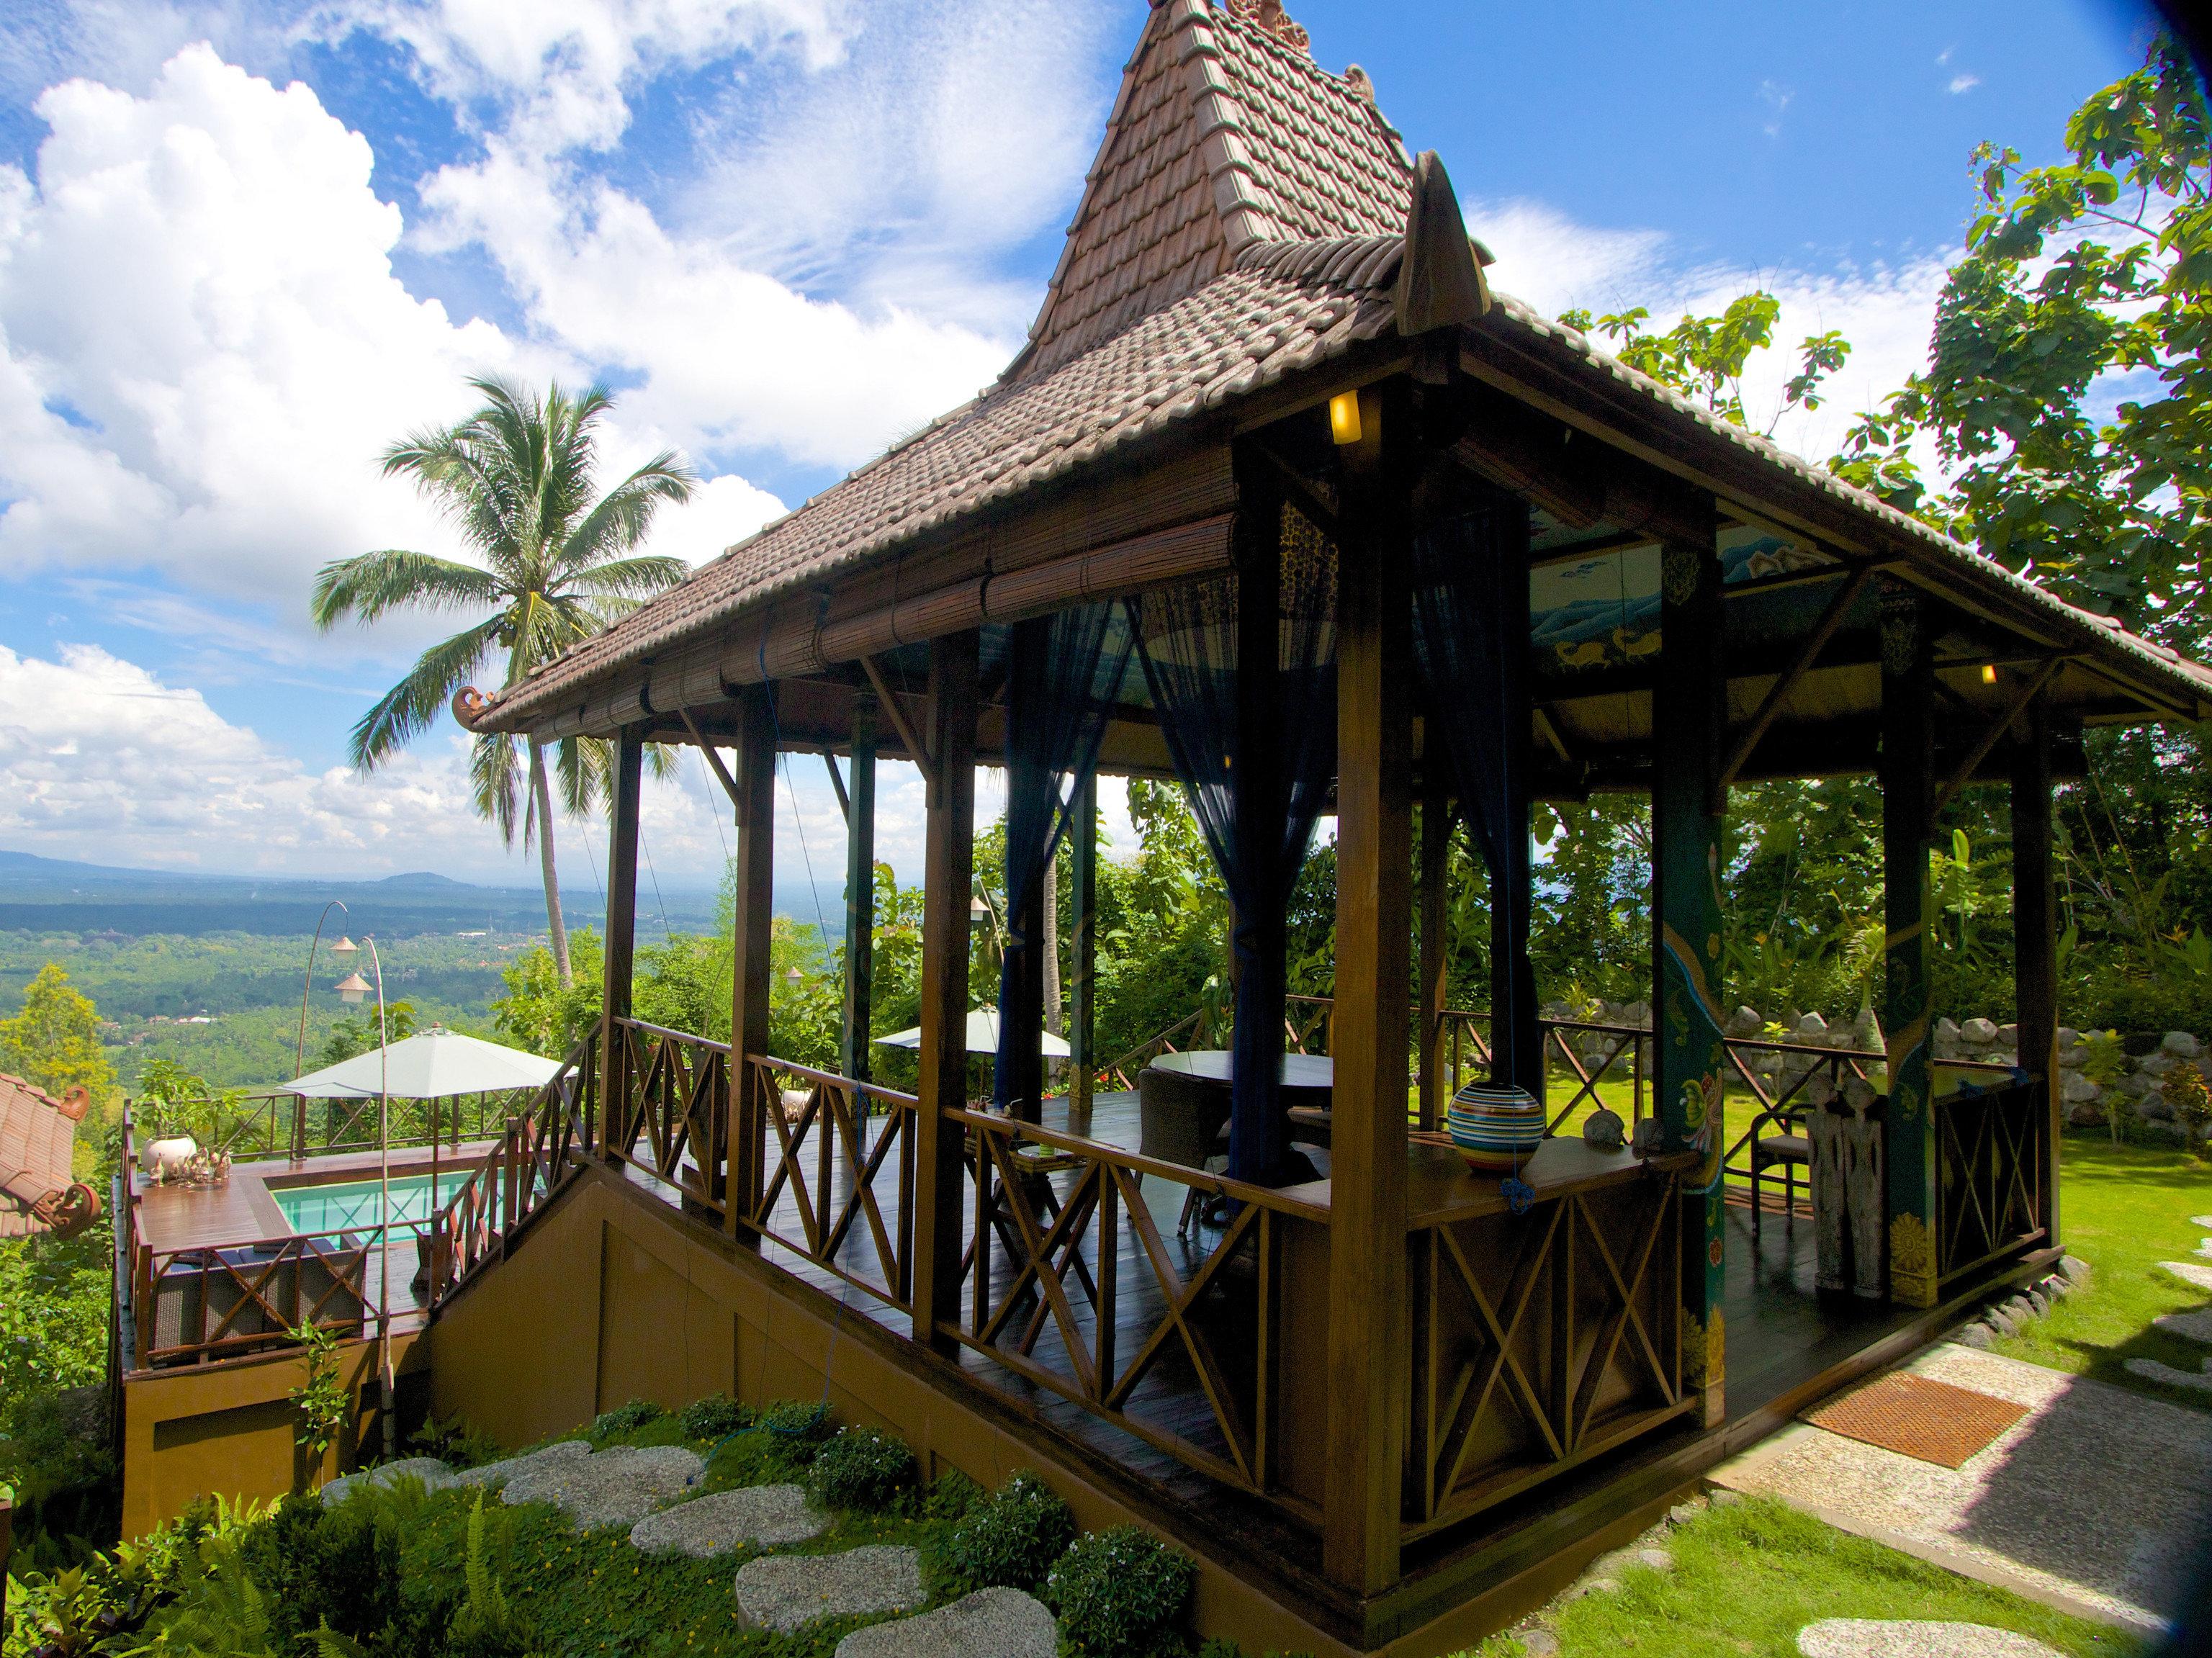 sky tree building Resort porch gazebo outdoor structure pavilion cottage Deck day